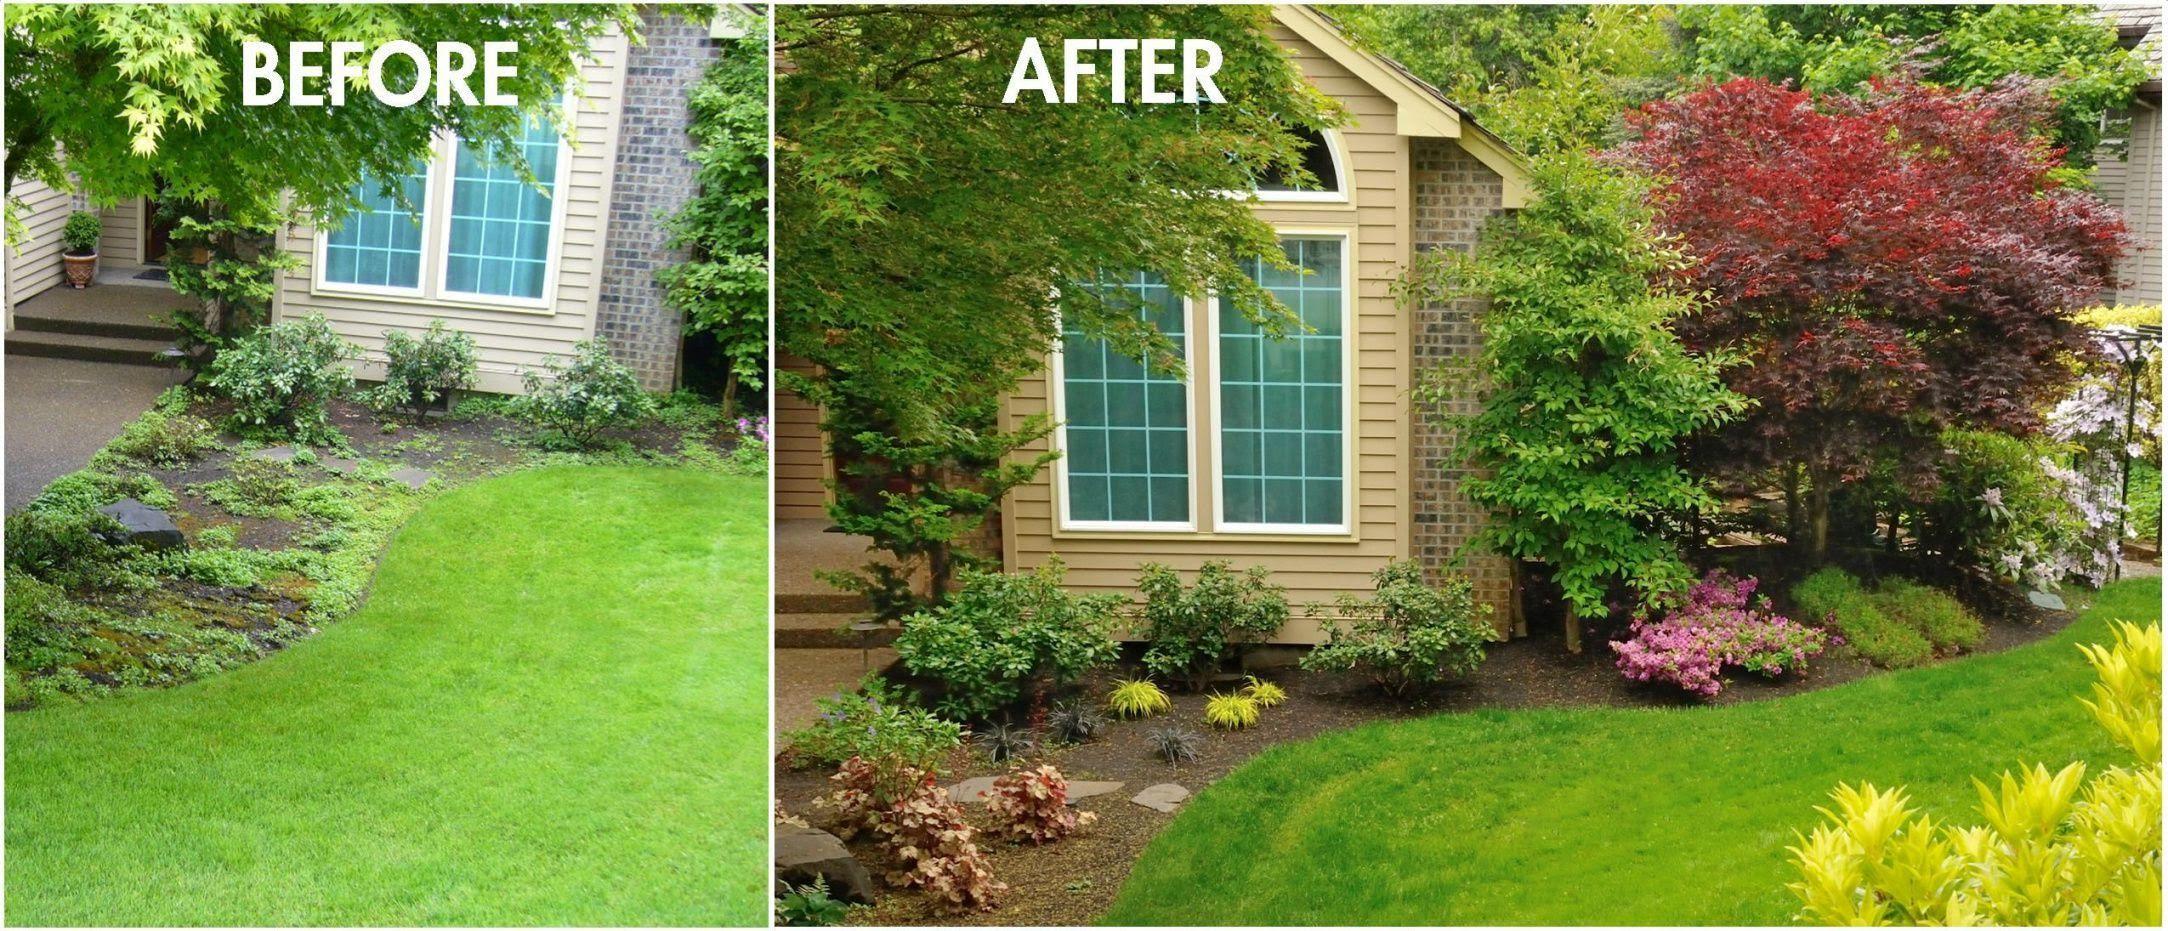 Elegant Outdoor Diy Landscaping In 2020 Diy Backyard Landscaping